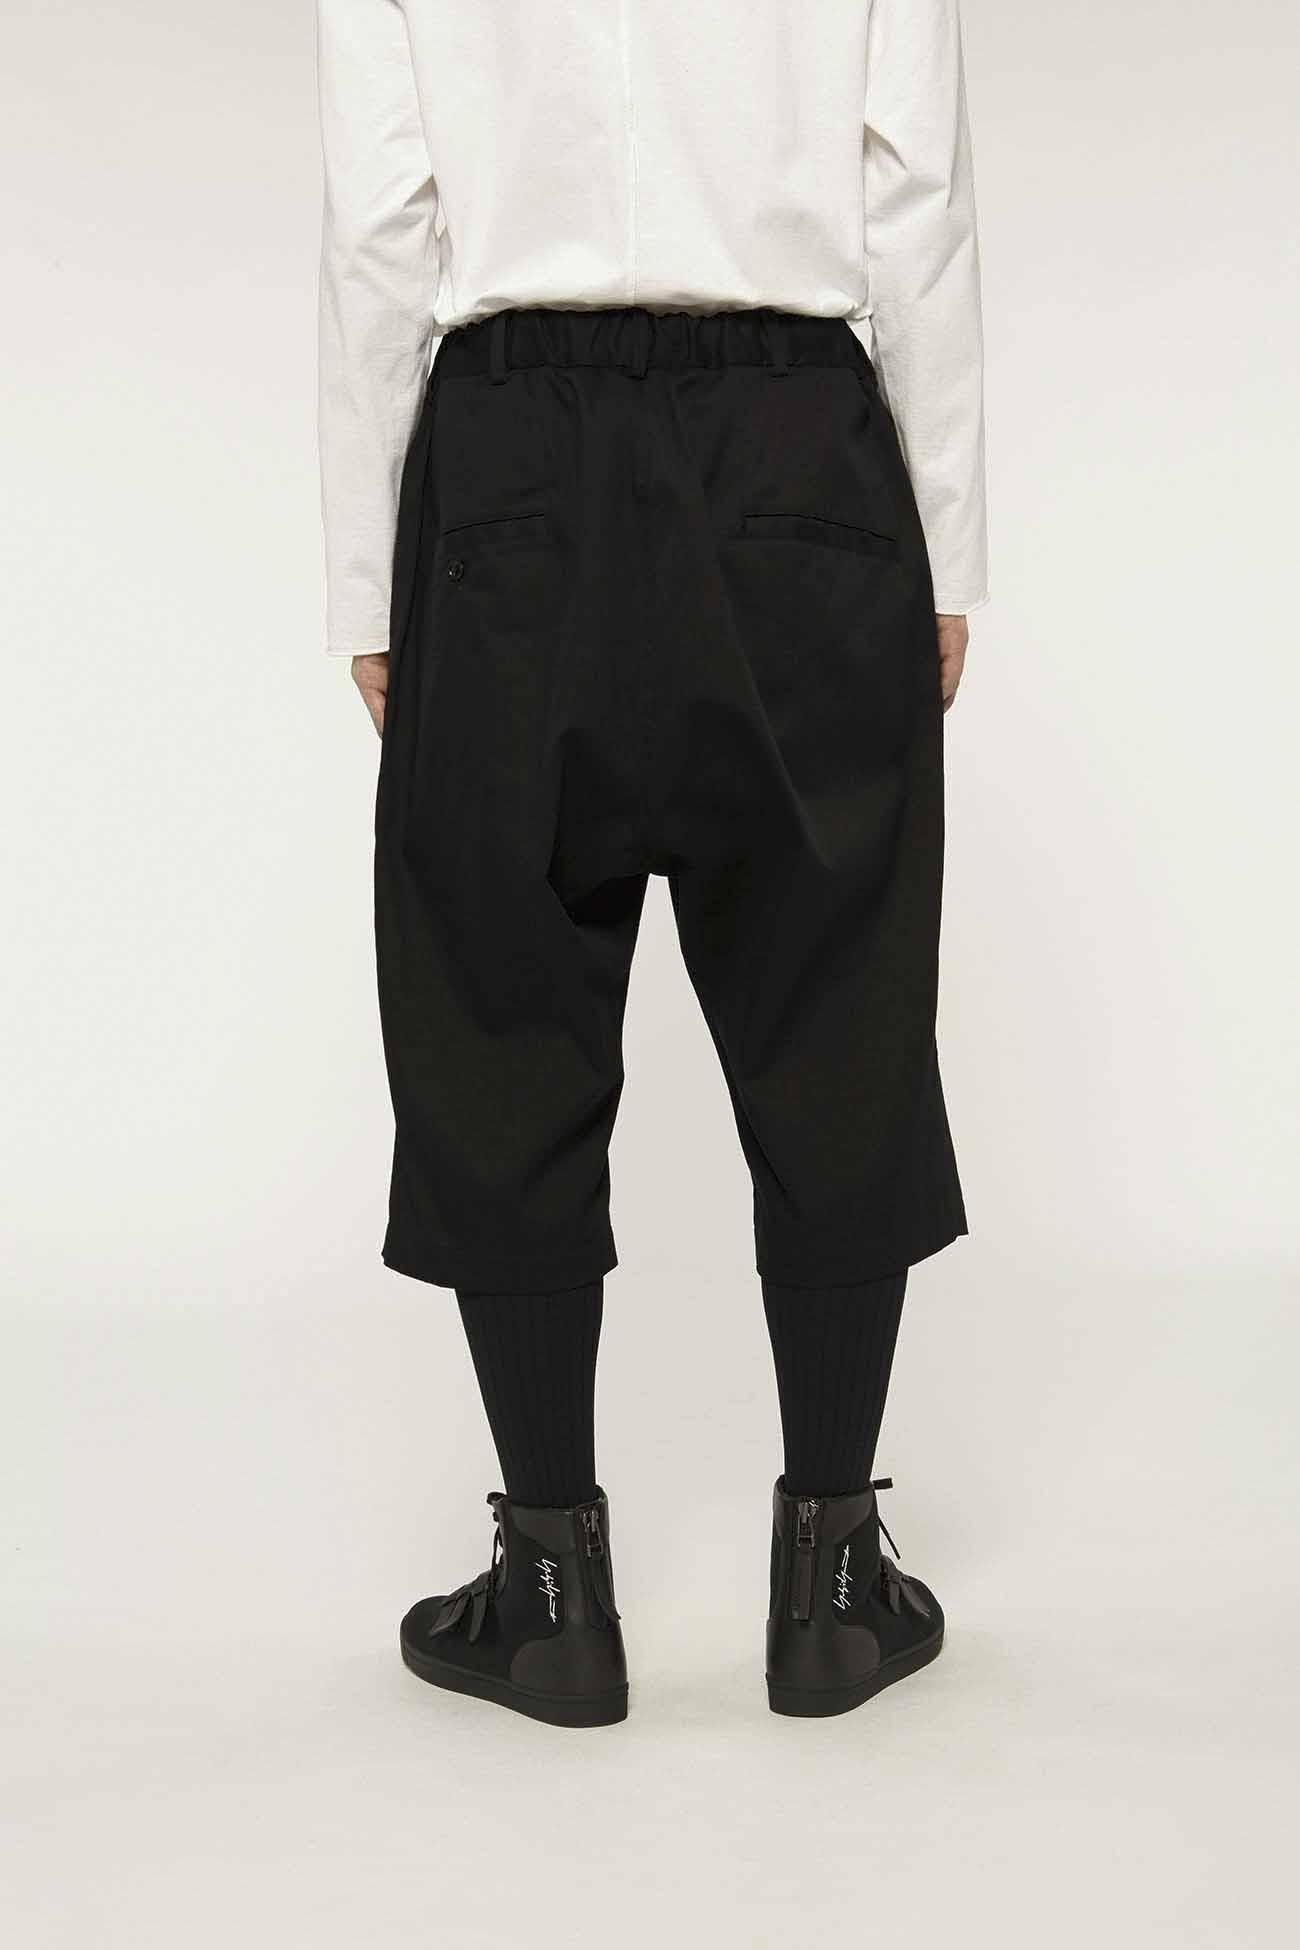 20/Cotton Twill Drop Hip 6-Quarter-Length Pants